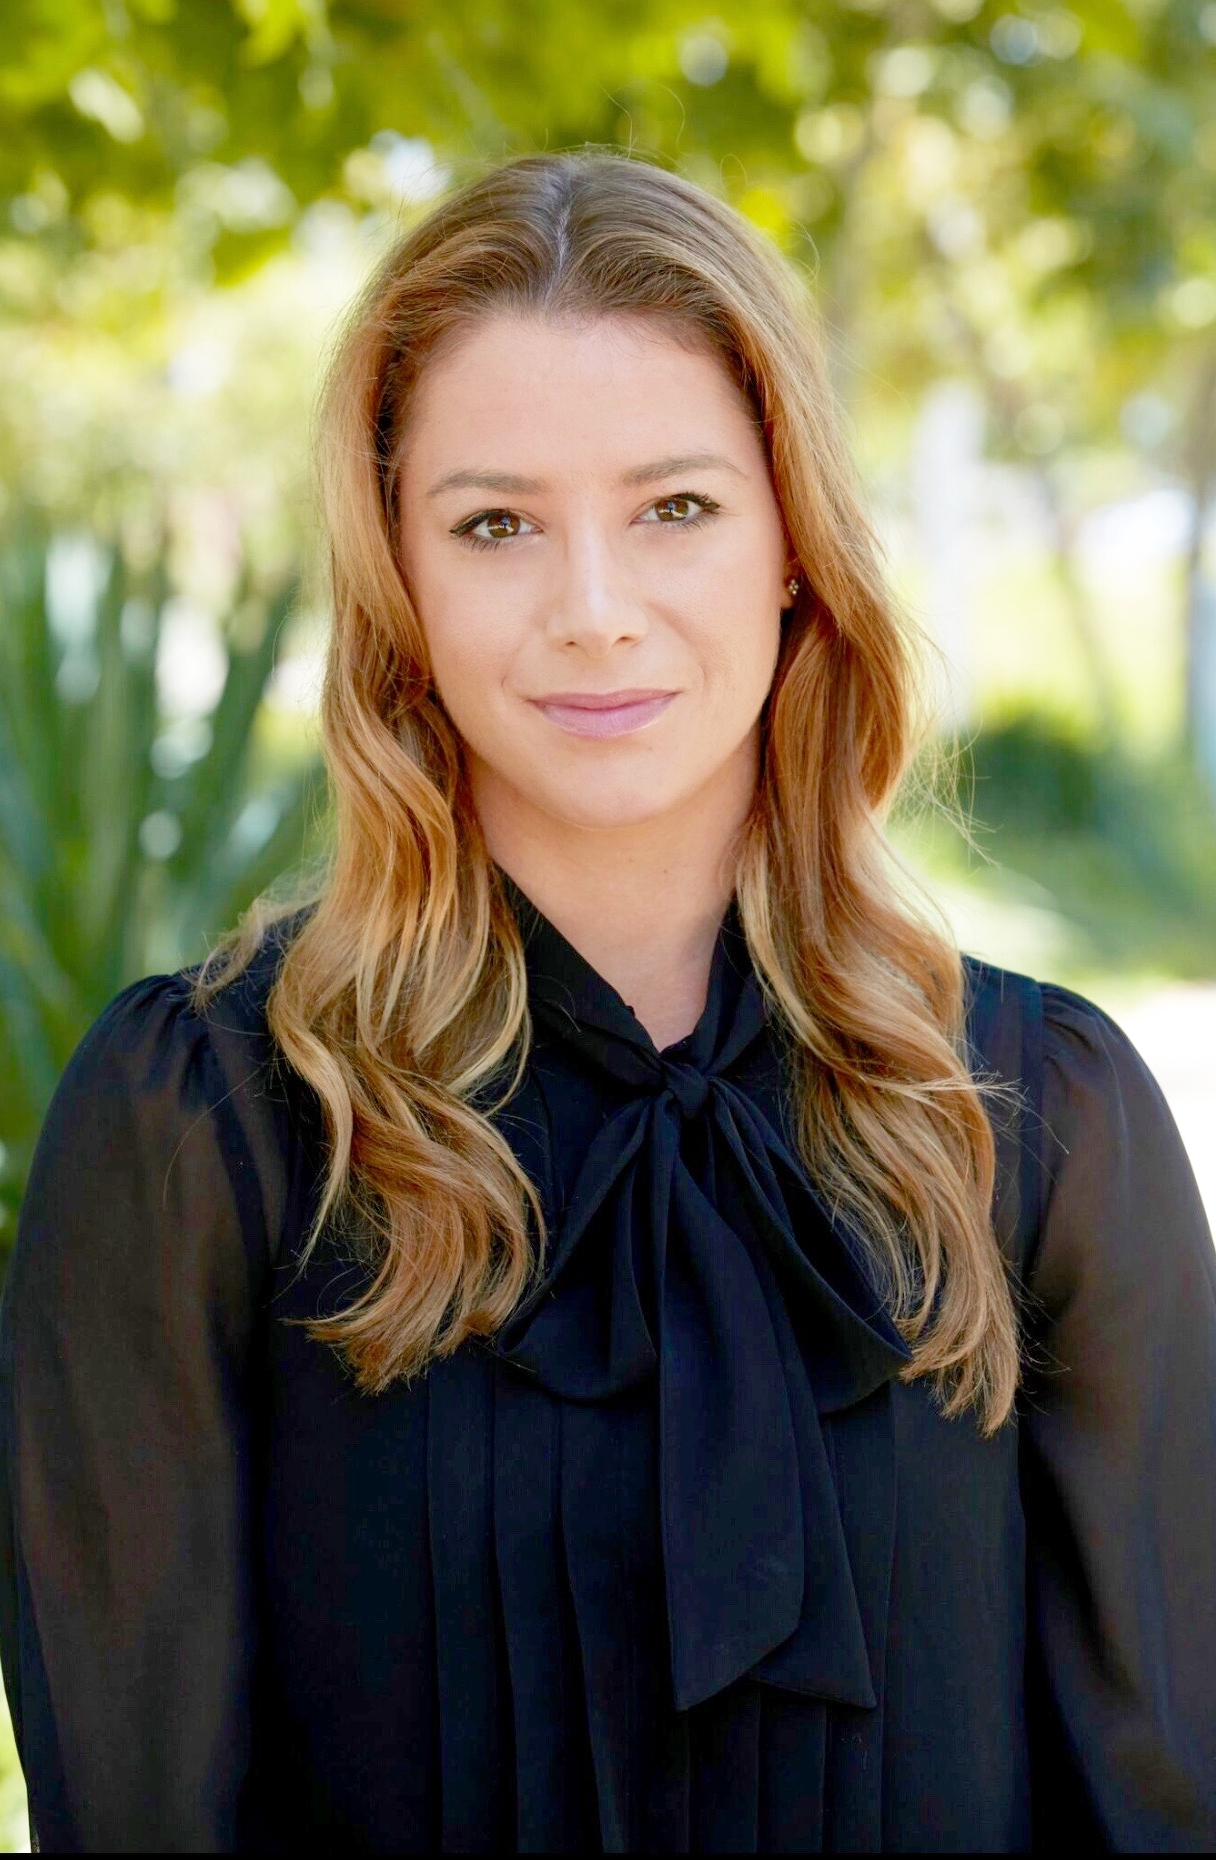 Jessica Mause - Senior Vice President